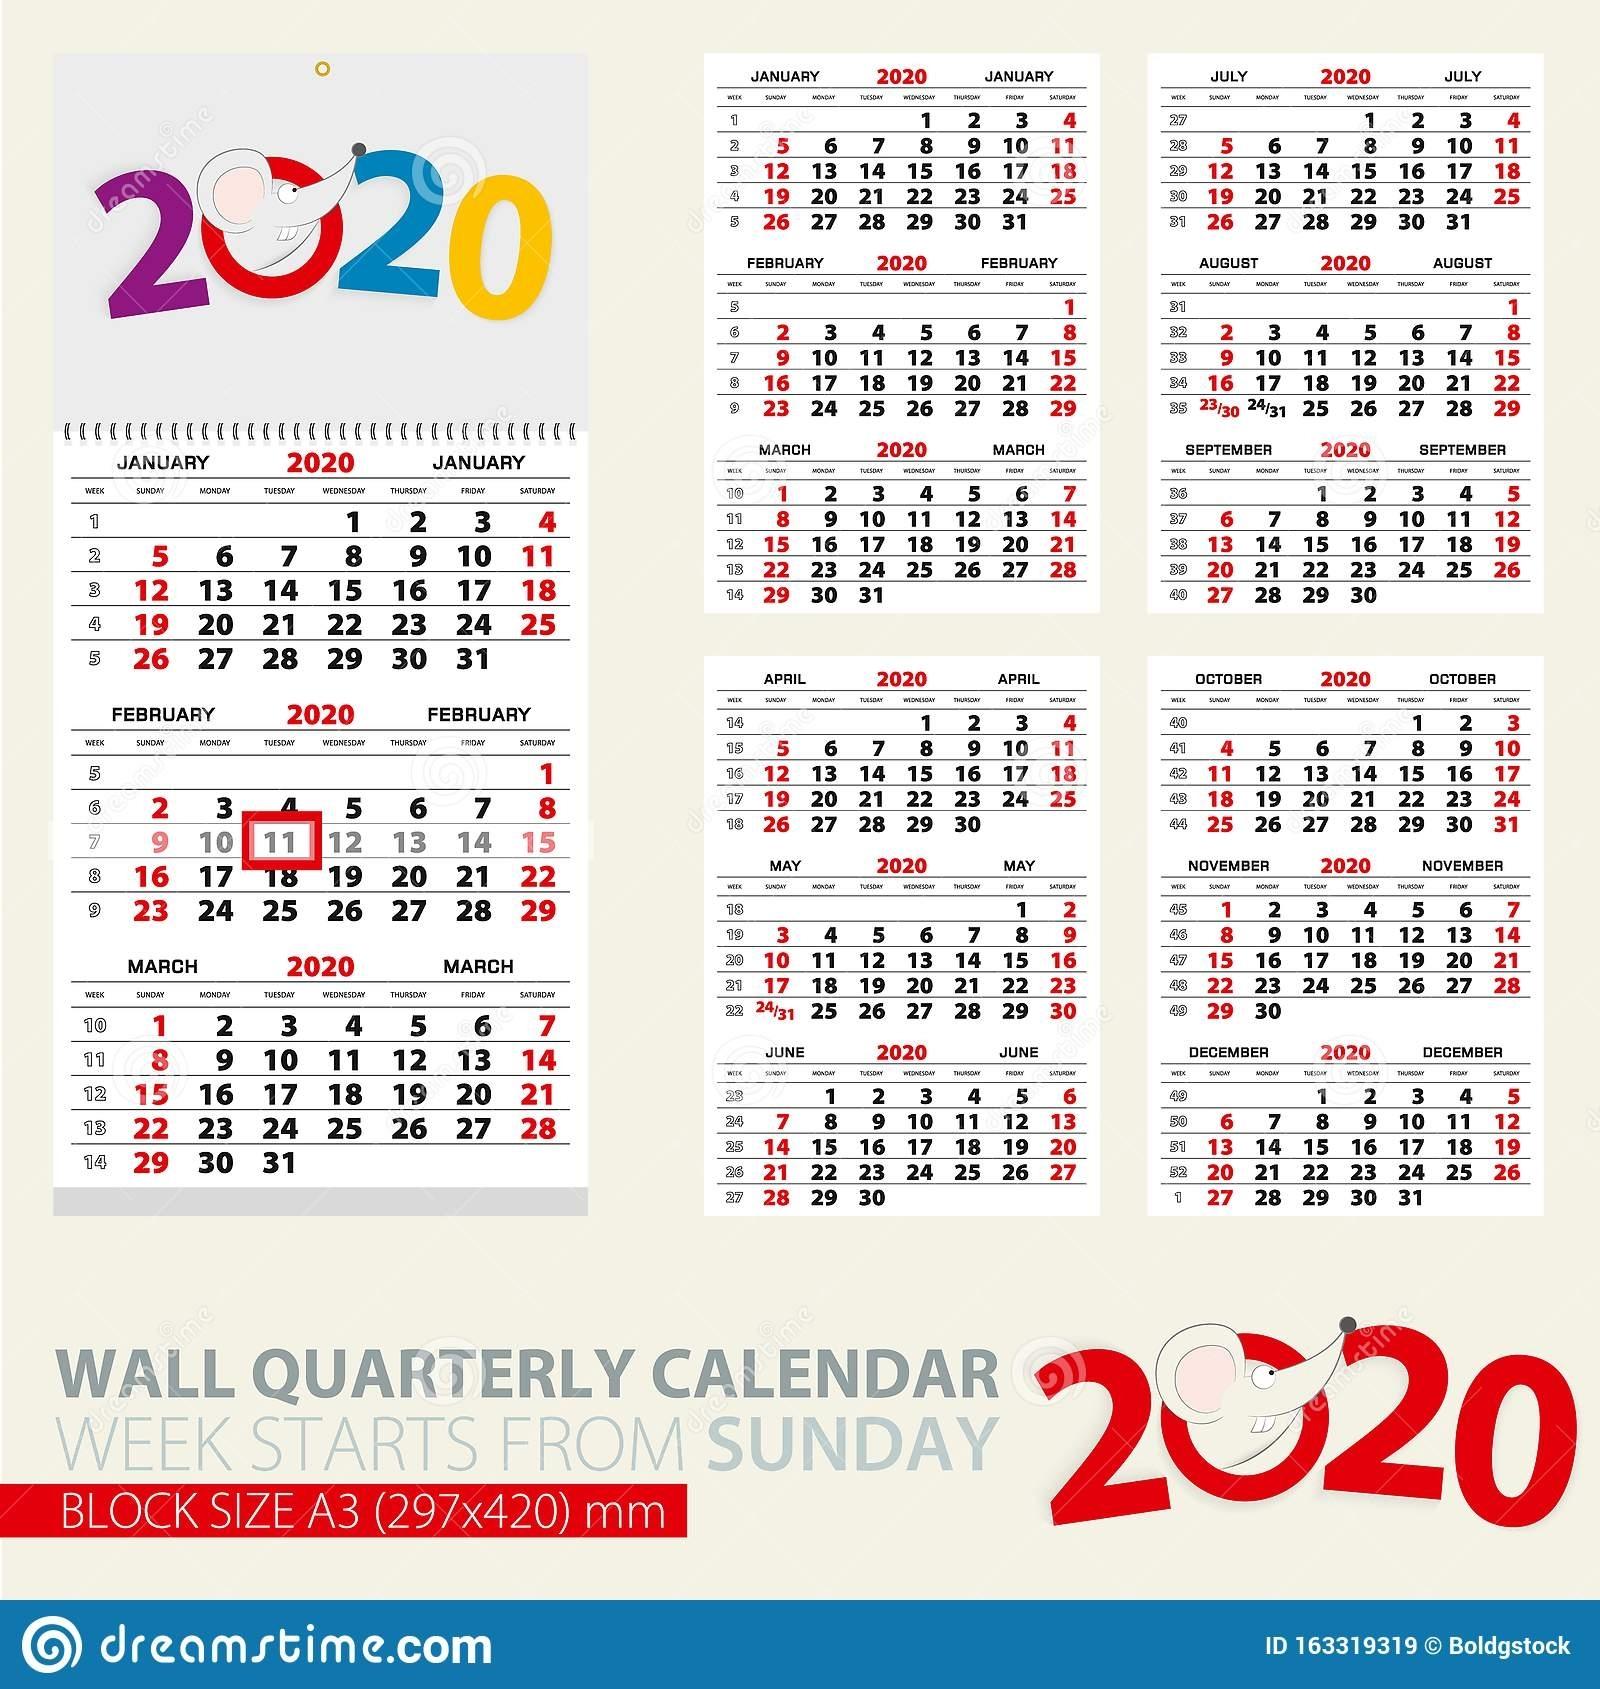 Plantilla Impresa Del Calendario Trimestral Mural Para 2020